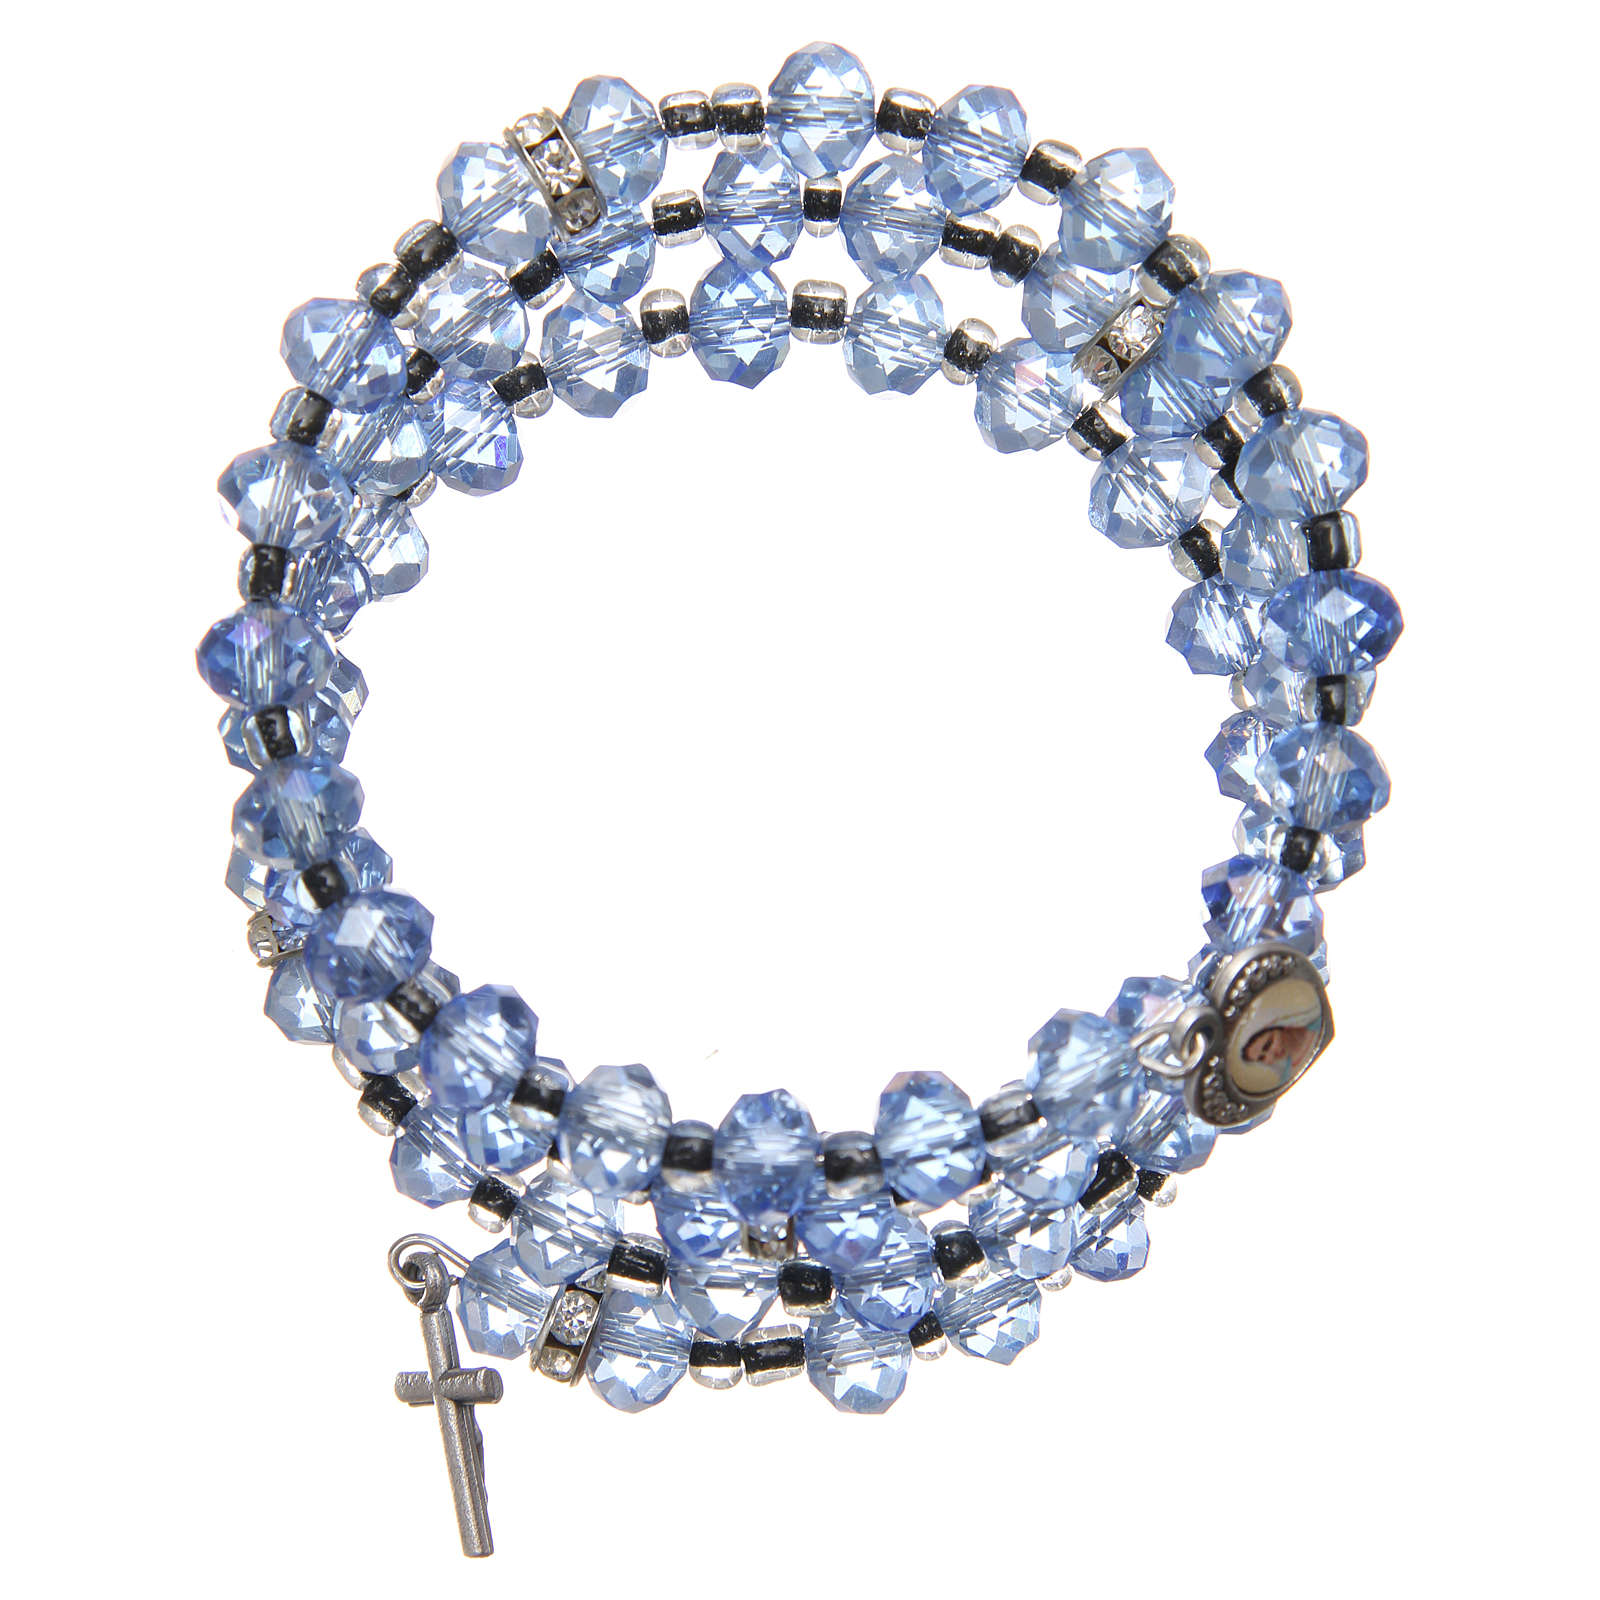 Pulsera muelle perlas azul claro cruz Virgen de Medjugorje 4